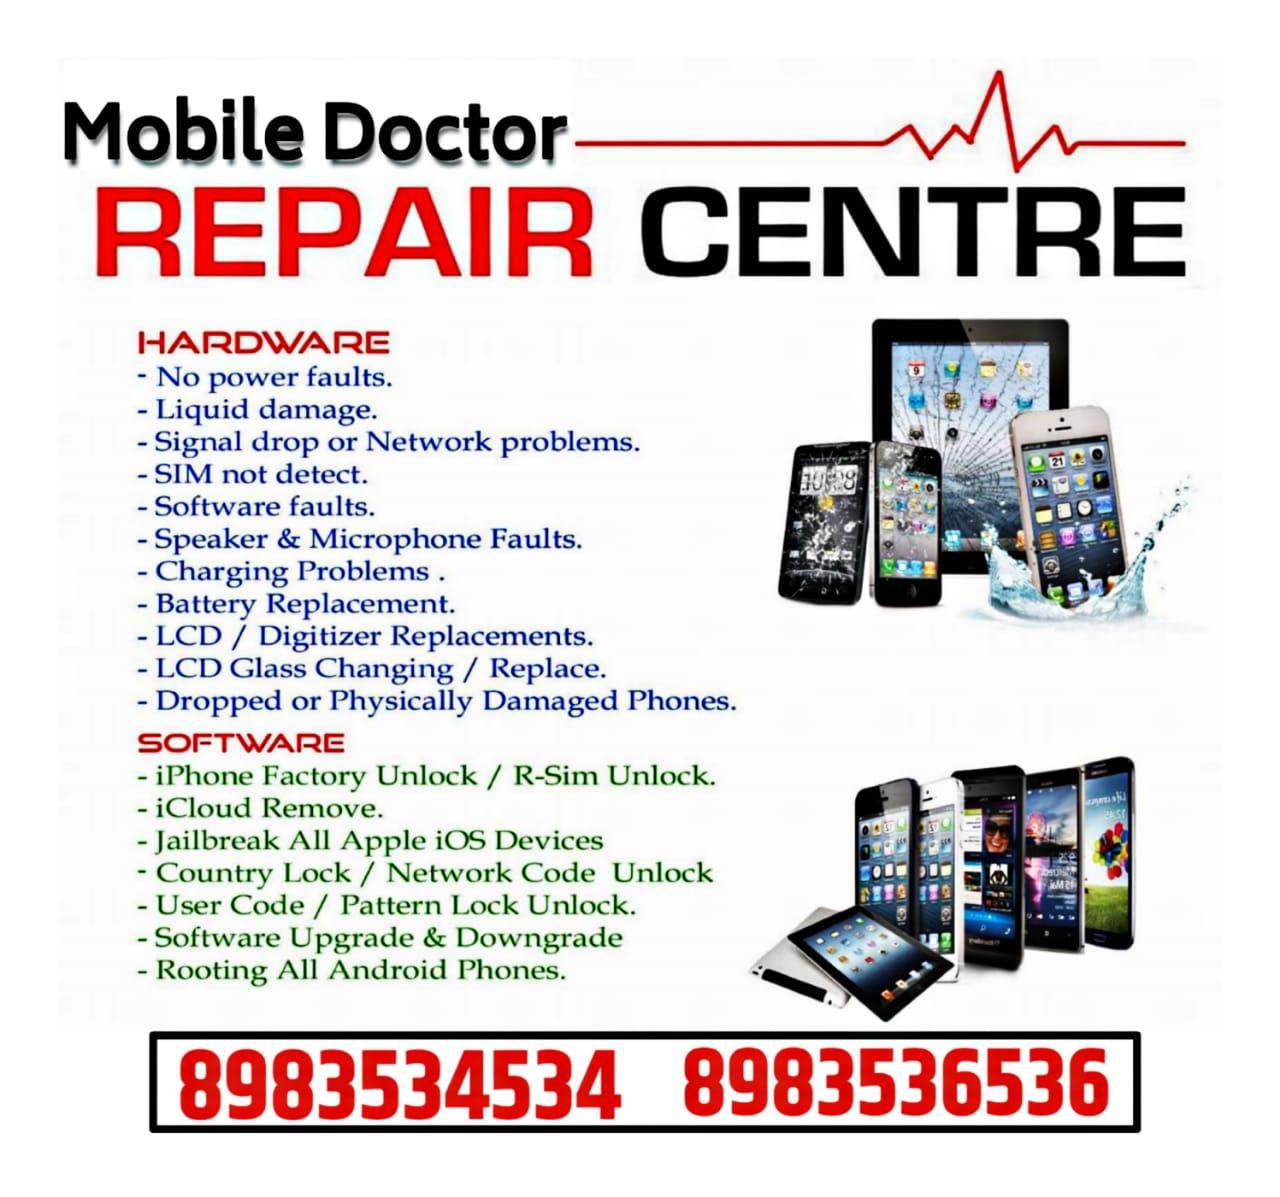 Amoi iPhone Service Centers, Repair in Kharadi, Pune